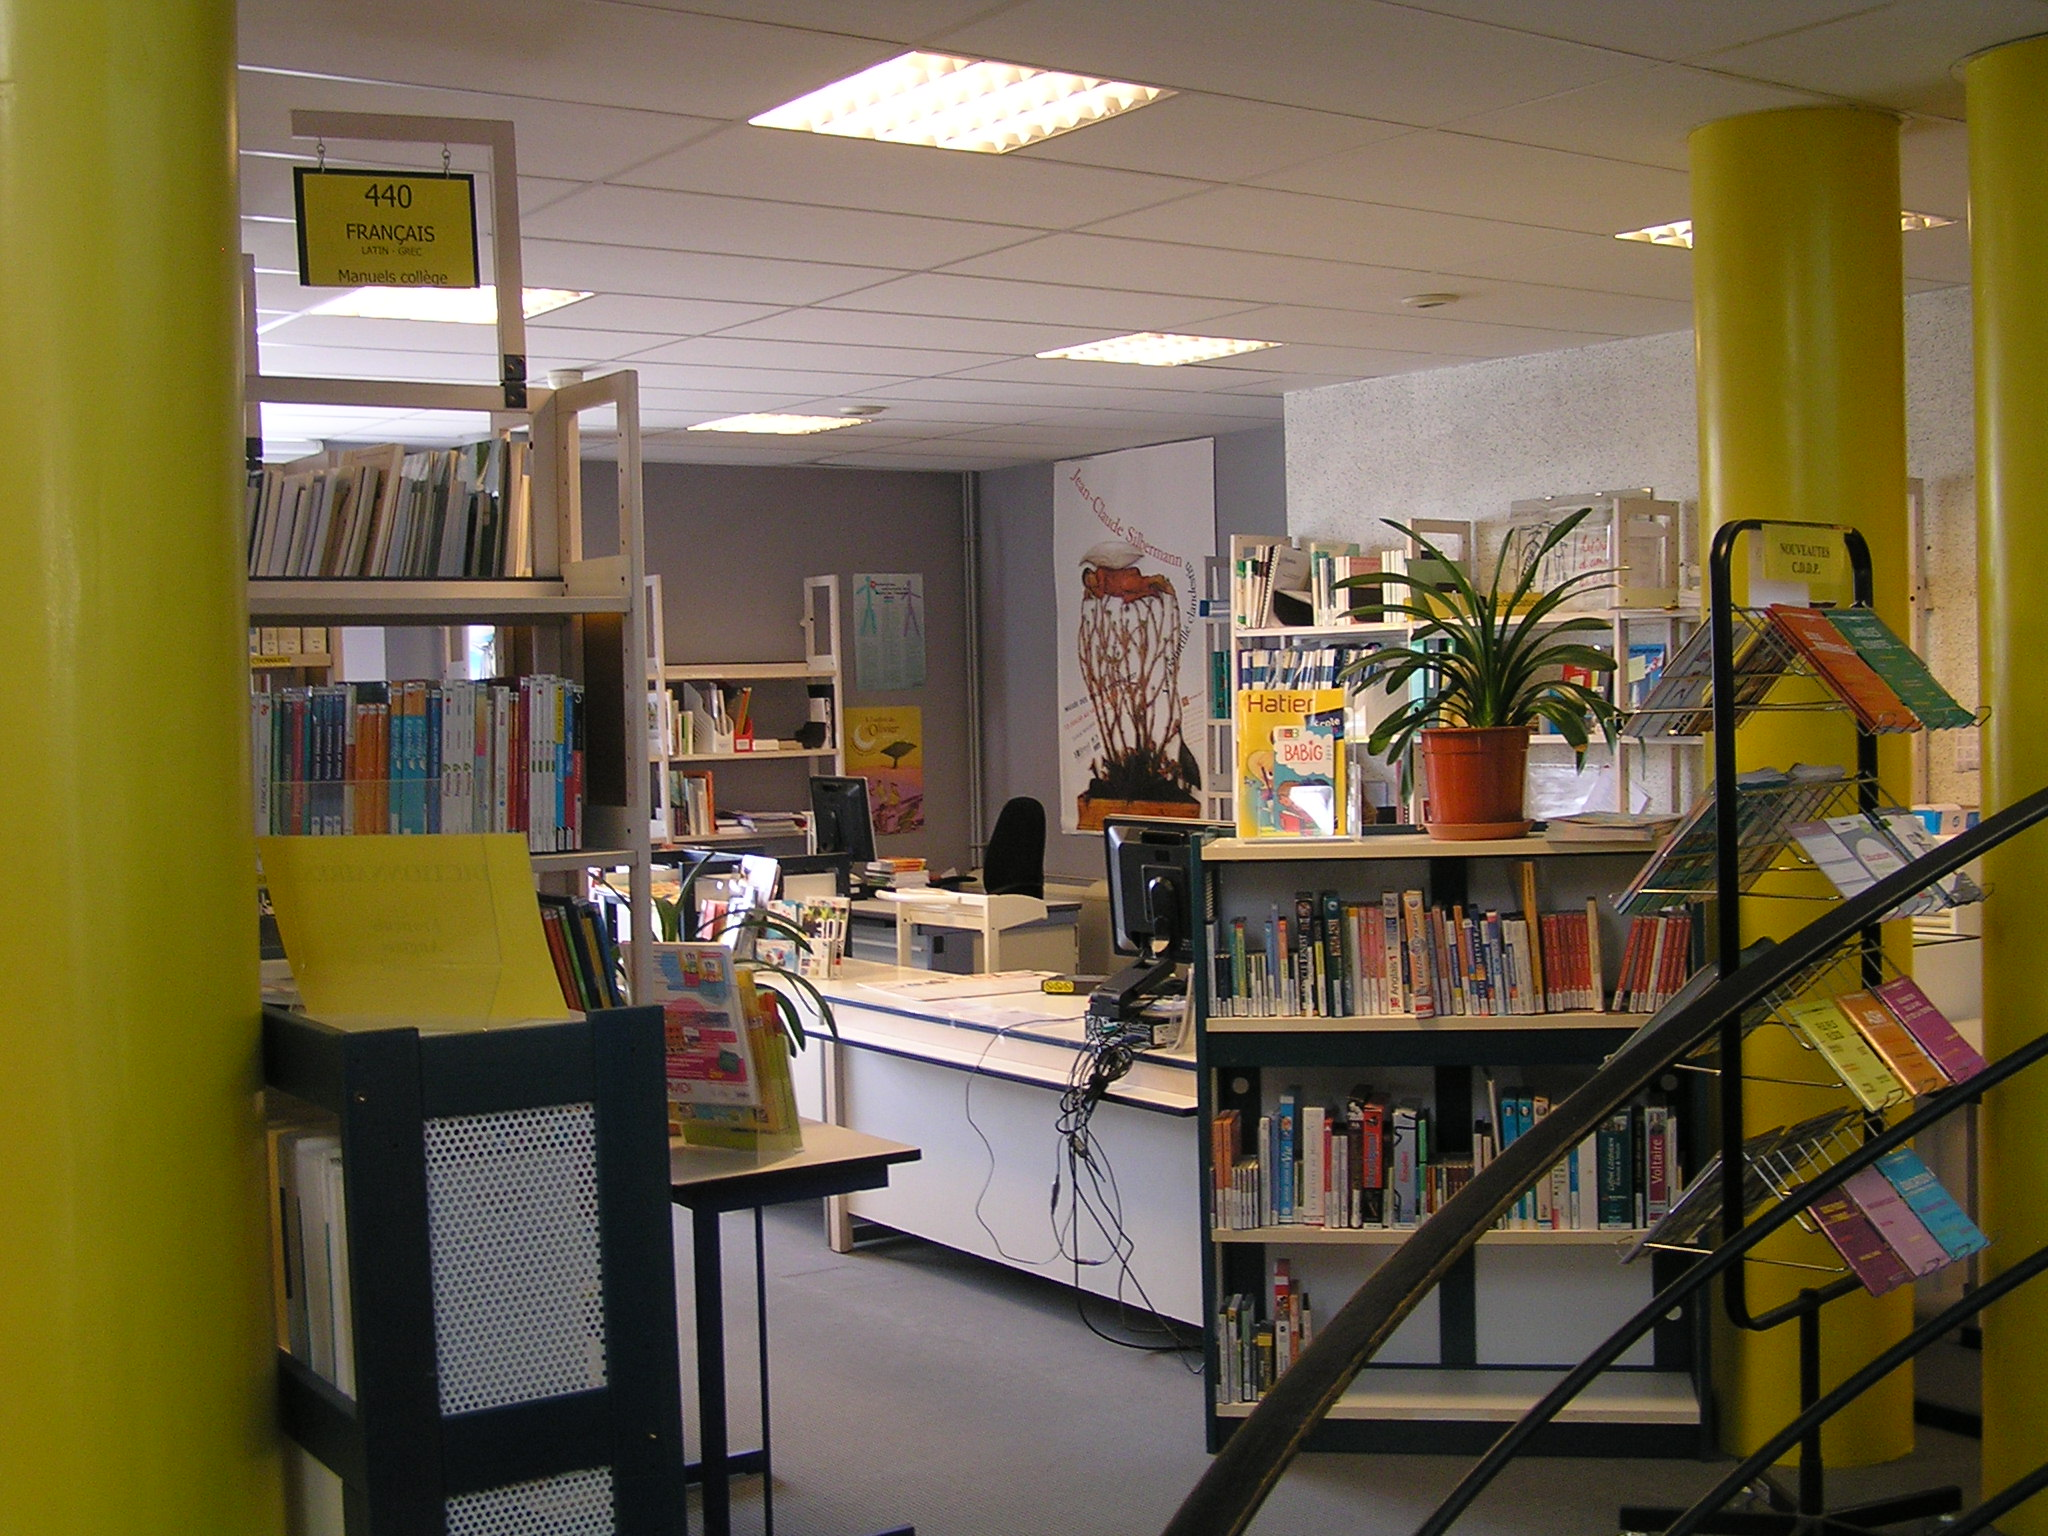 fichier biblioth que de formation des ma tres iufm brest france banque de pr t jpg. Black Bedroom Furniture Sets. Home Design Ideas